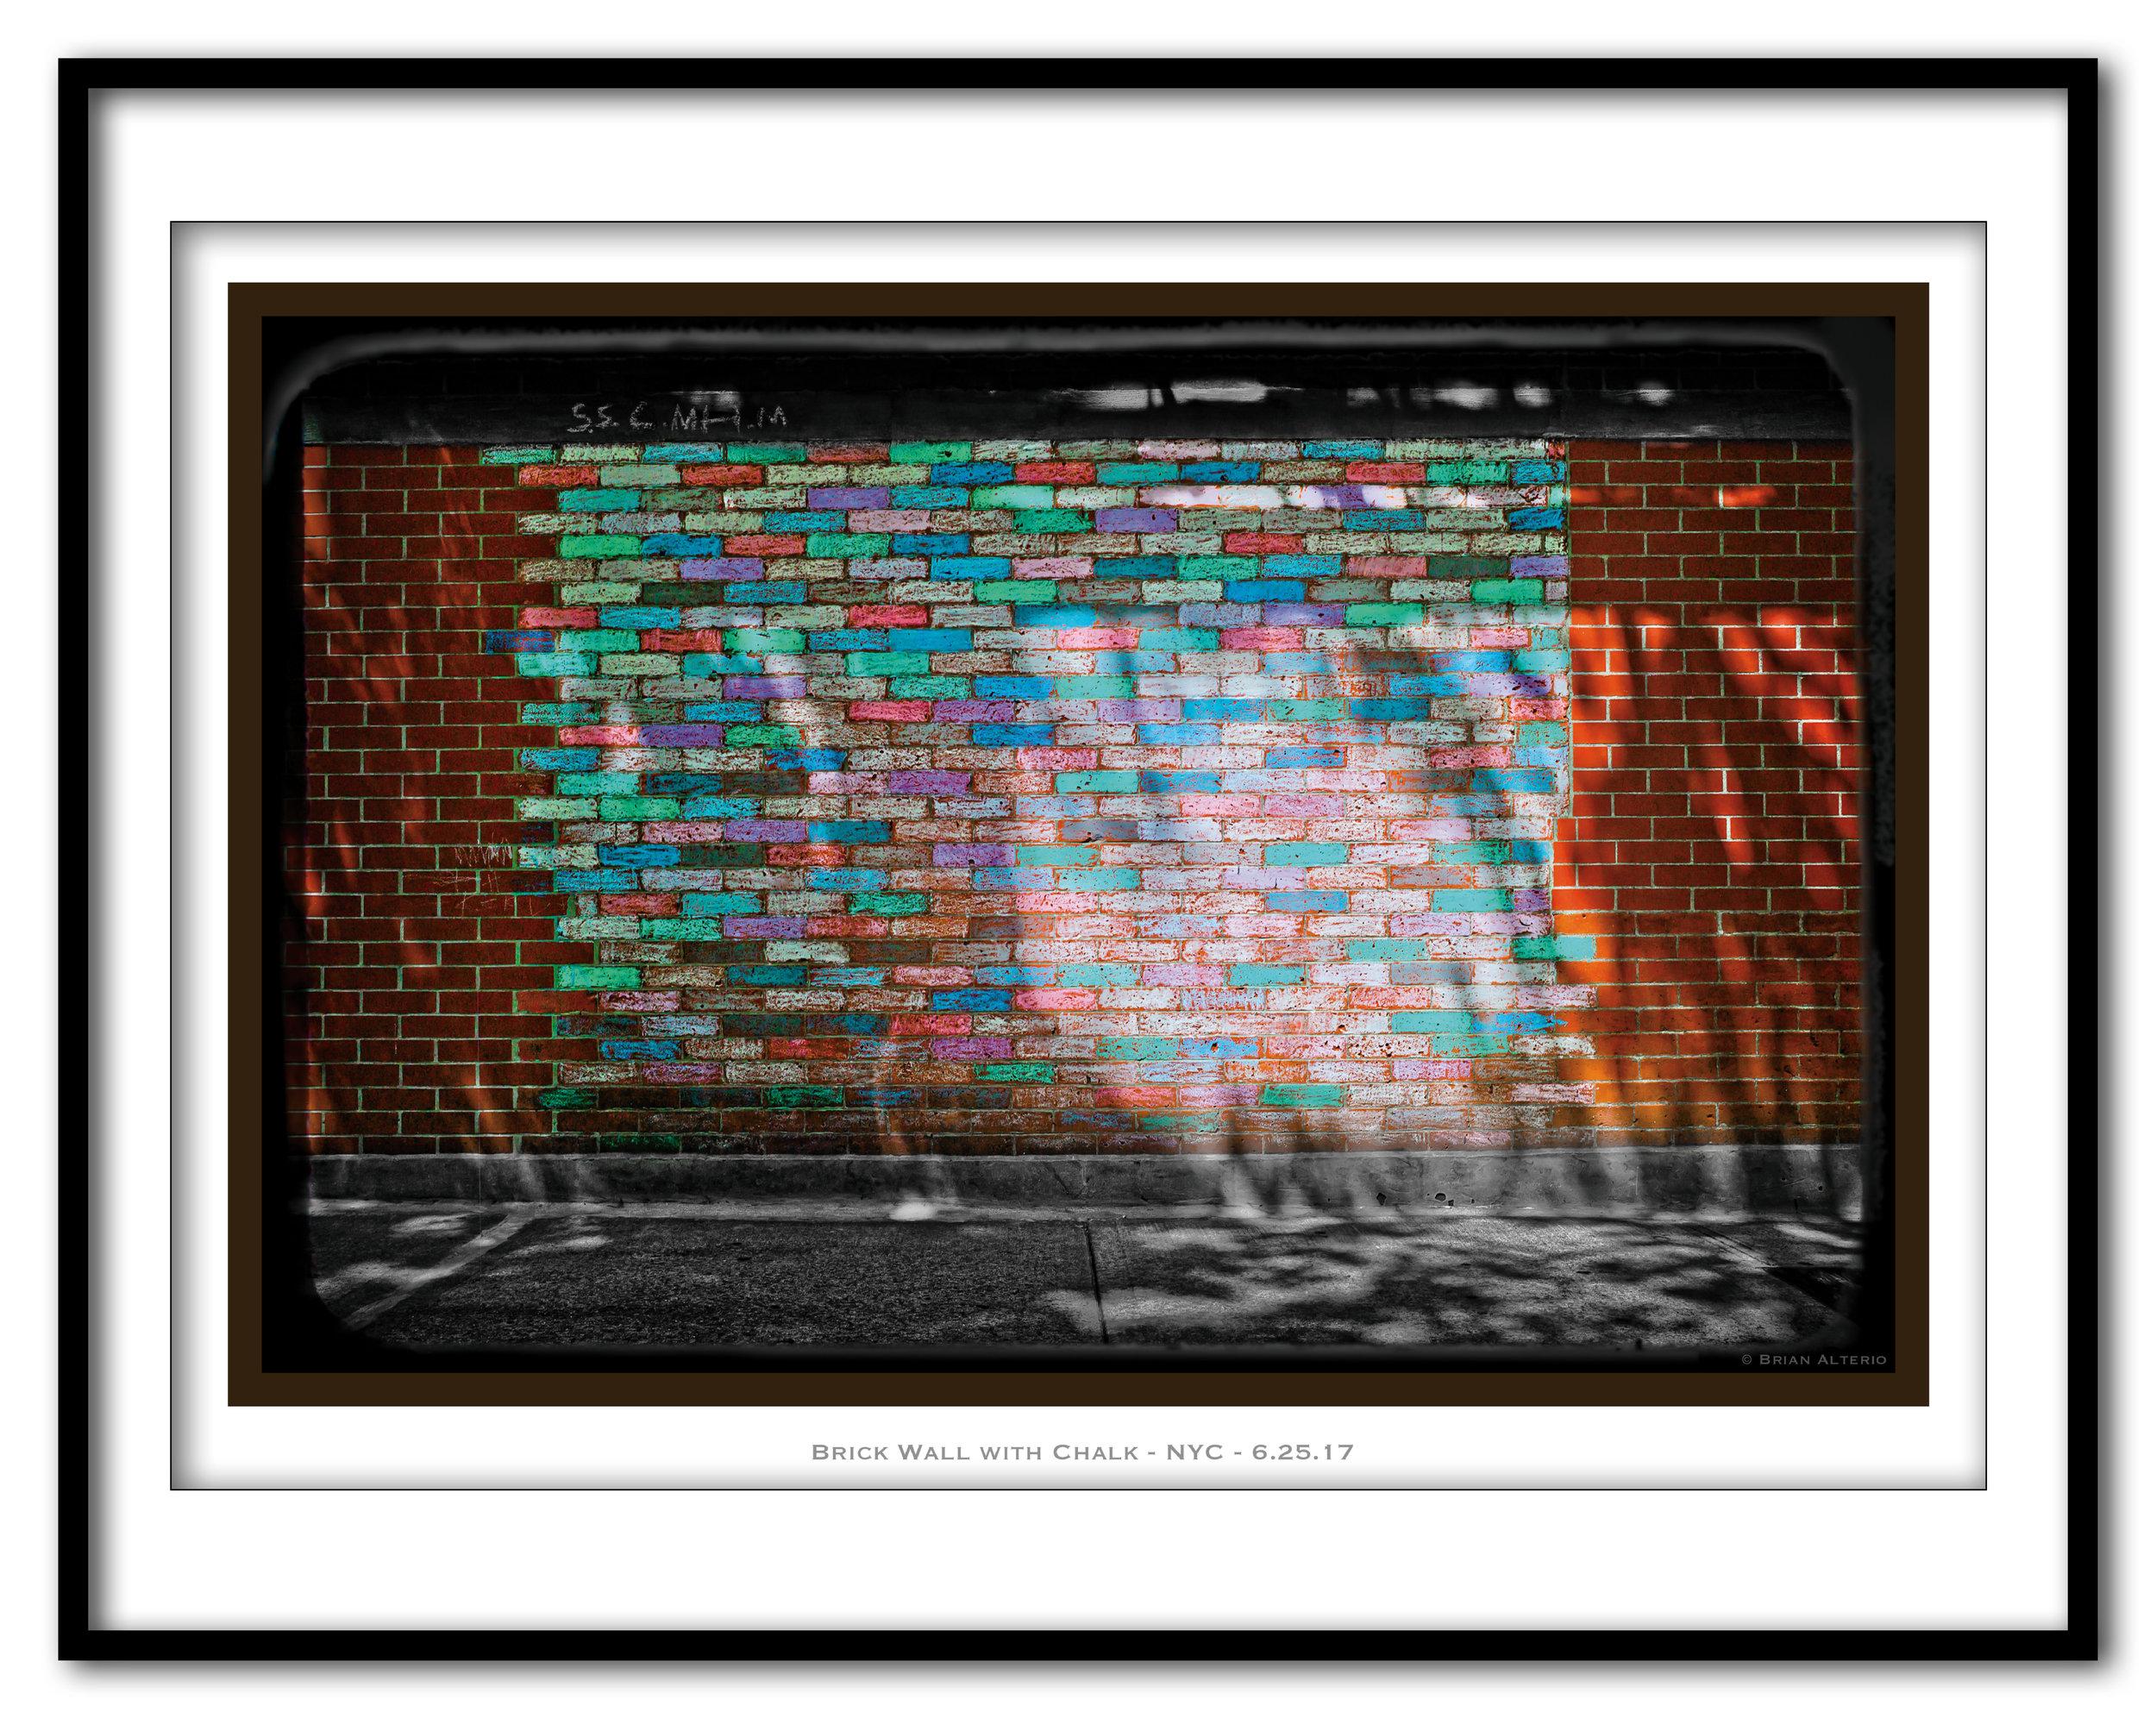 Brick Wall with Chalk - NYC 6.25.17 - Framed.jpg